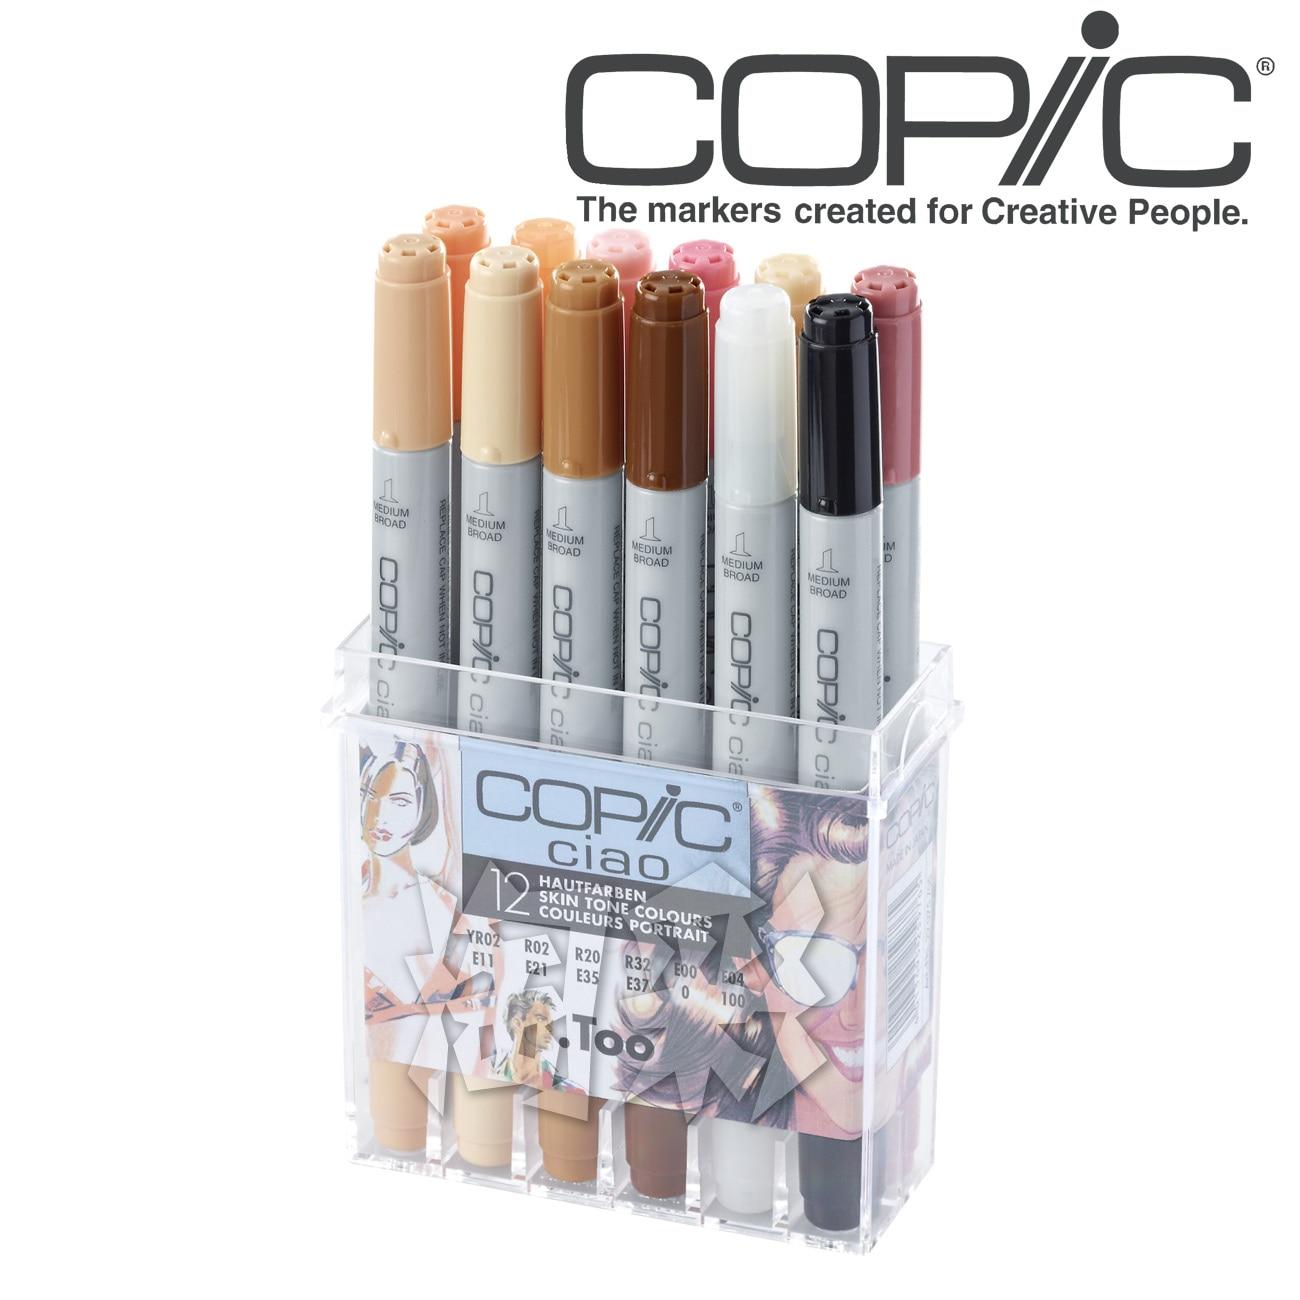 Купить с кэшбэком Copic Art Markers Set Color Pen Animation Sketch Drawing Copic Alcohol Anime Brush Marker Pen